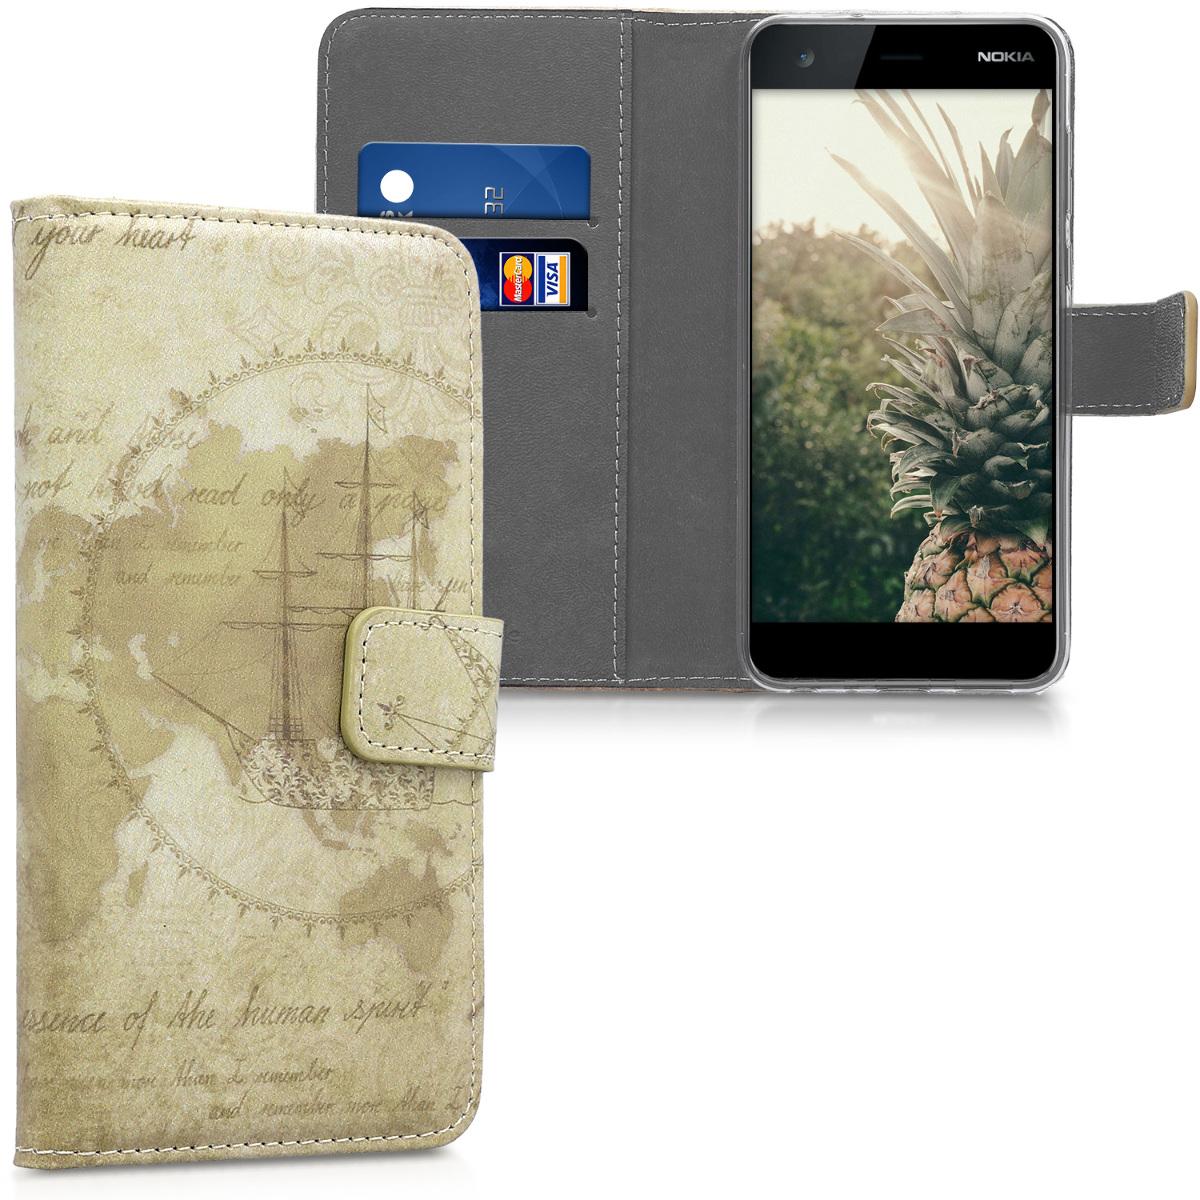 KW Θήκη Πορτοφόλι Nokia 2 - Συνθετικό Δέρμα - Brown / Light Brown (44513.02)